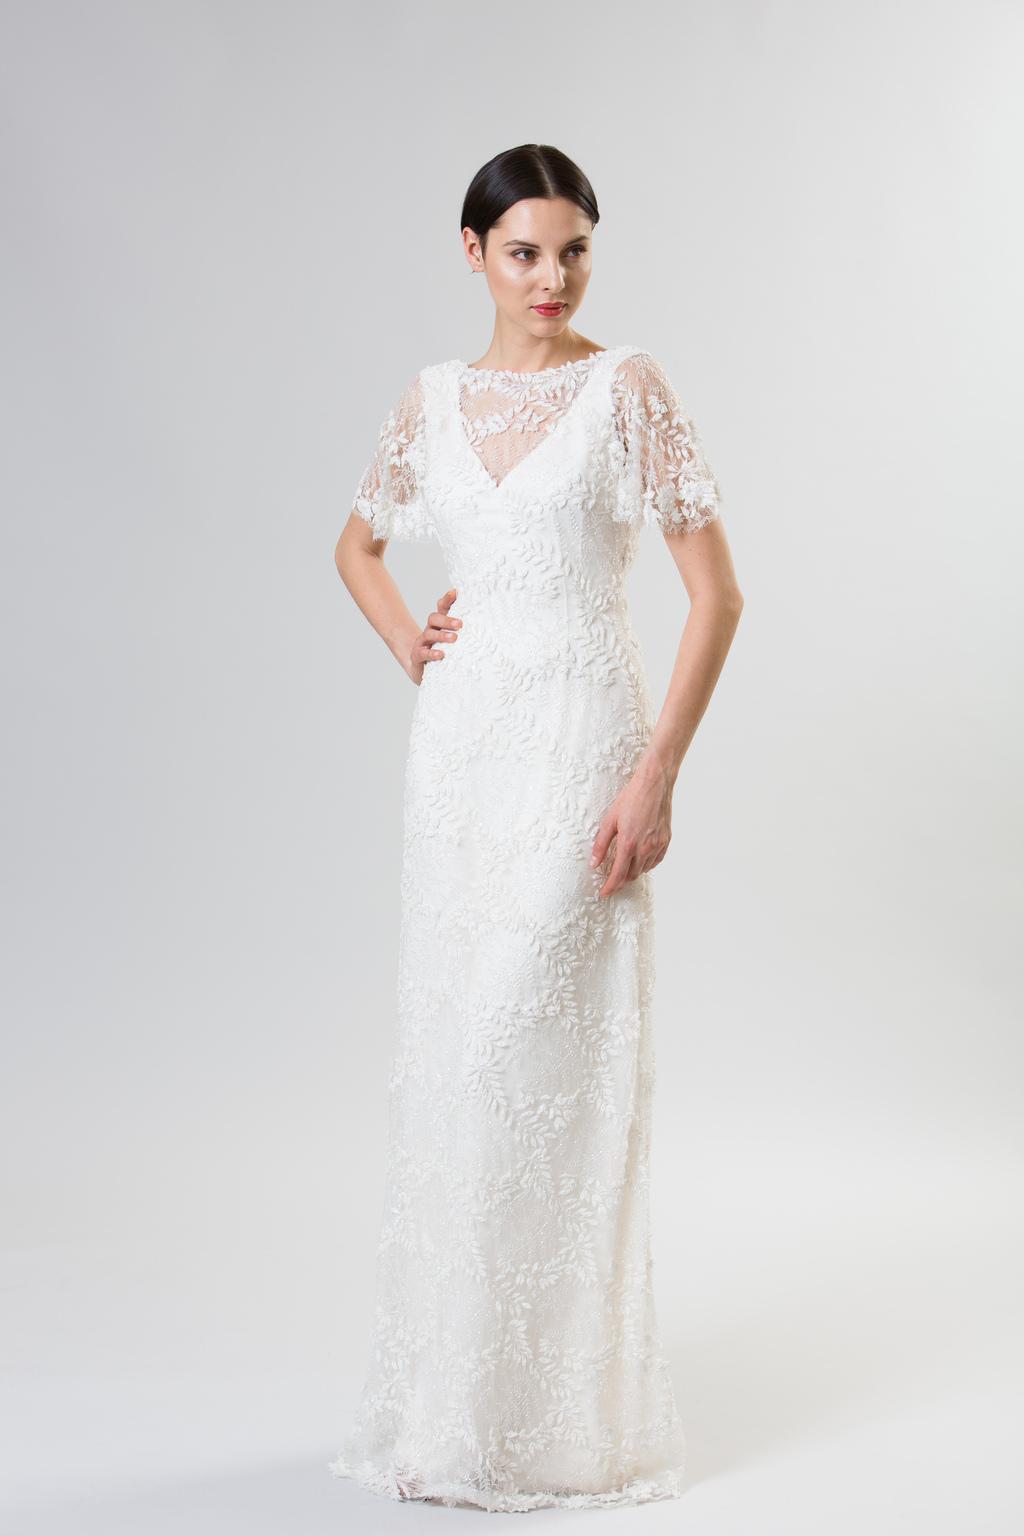 Junko-yoshioka-summer-spring-2014-wedding-dress-marzipan_1.full